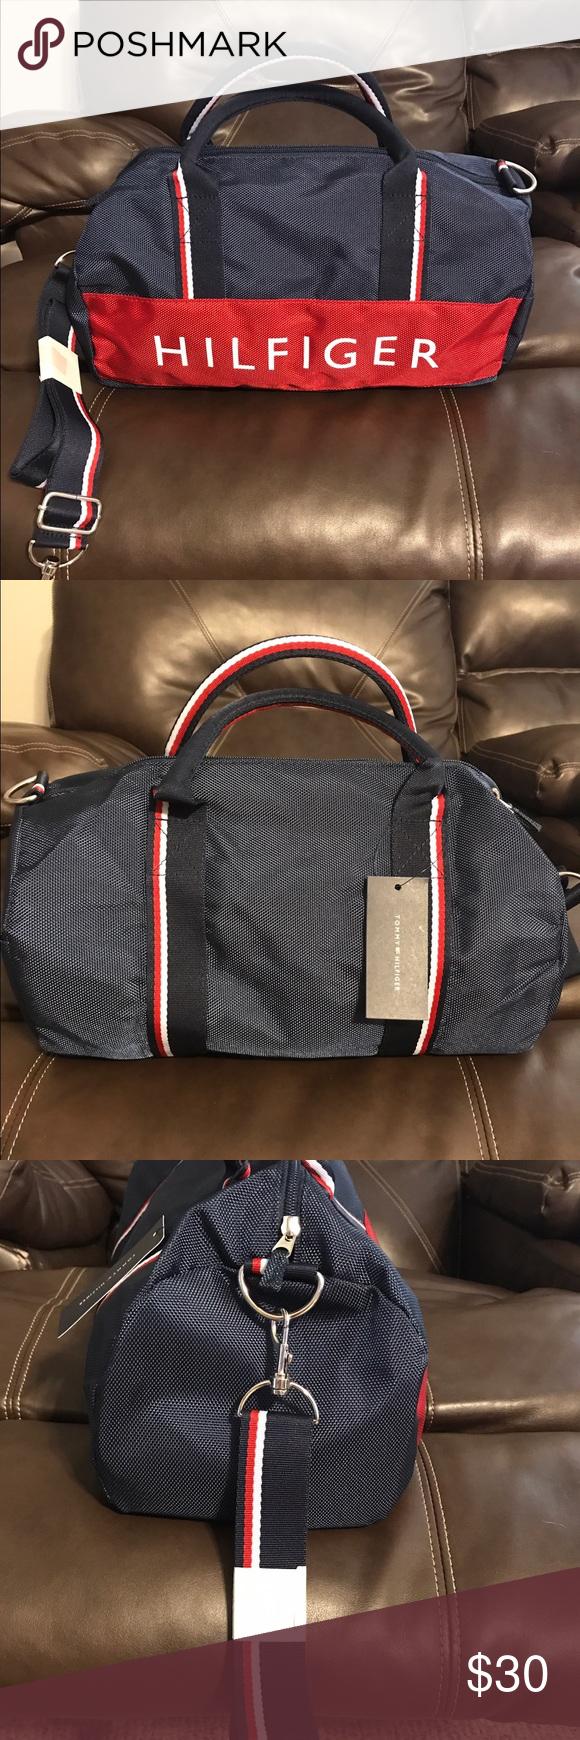 f1ce5cd1f6 Tommy Hilfiger Travel Gym Mini Duffle Bag